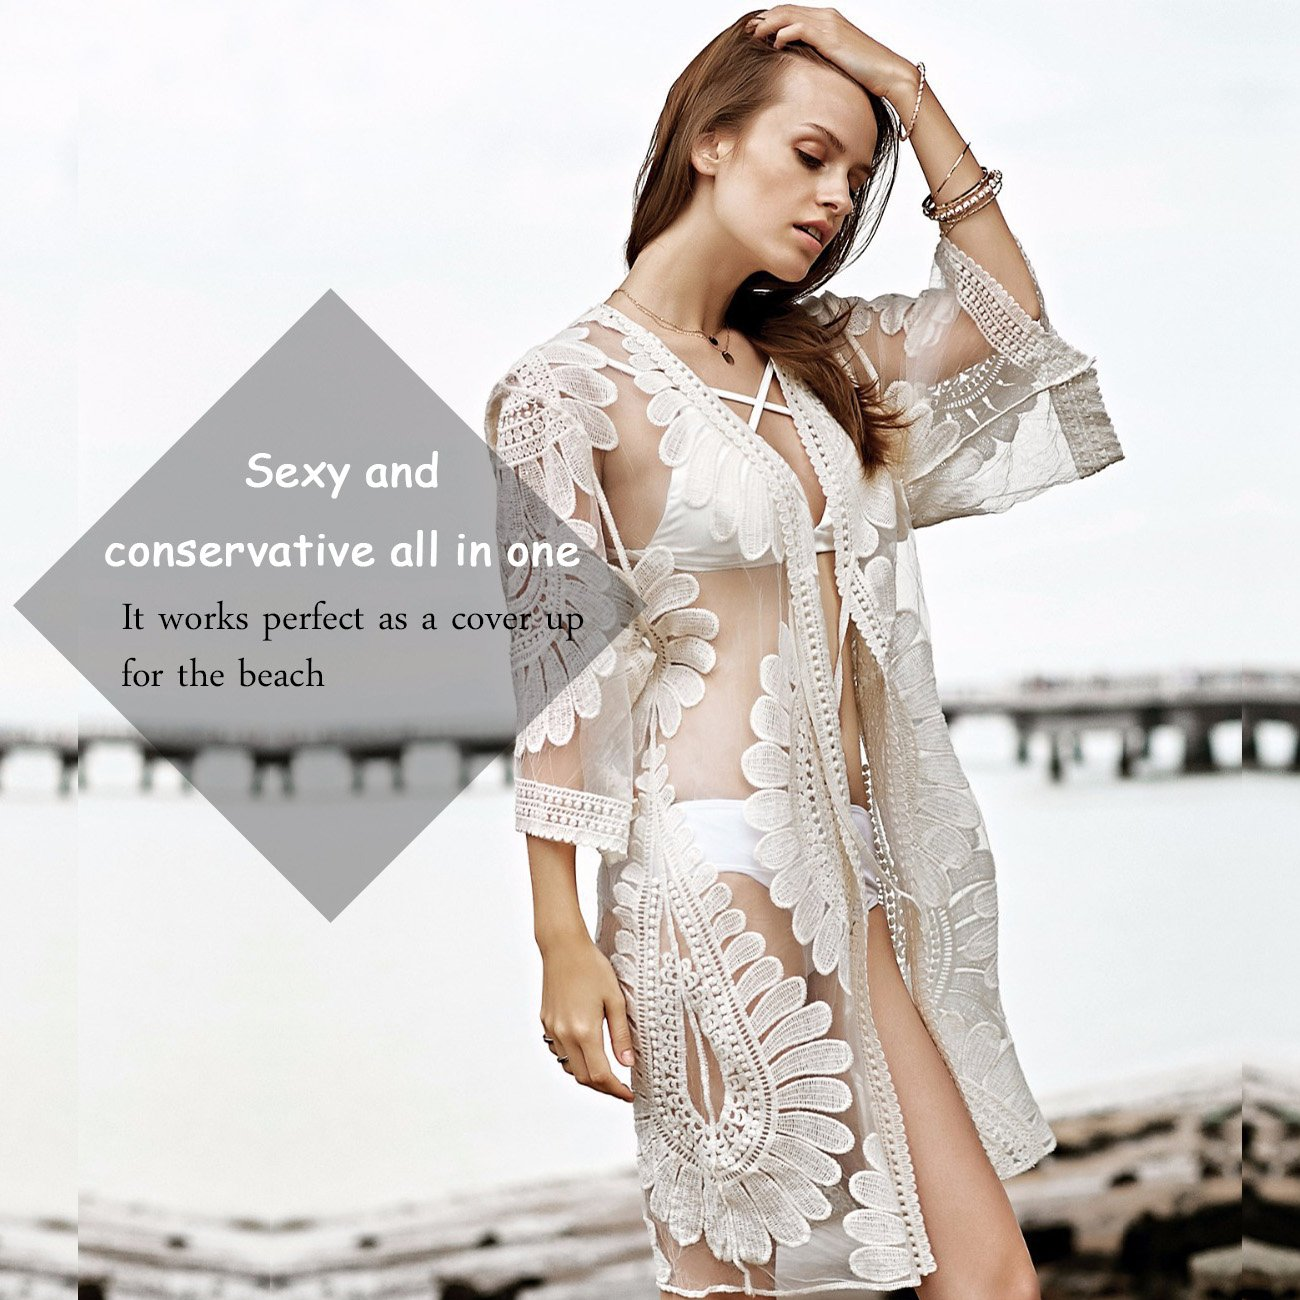 fc5dd8372d shermie Women's Floral Crochet Lace Beach Swimsuit Cover Ups Long Vintage  Kimono Cardigan (Beige) at Amazon Women's Clothing store: